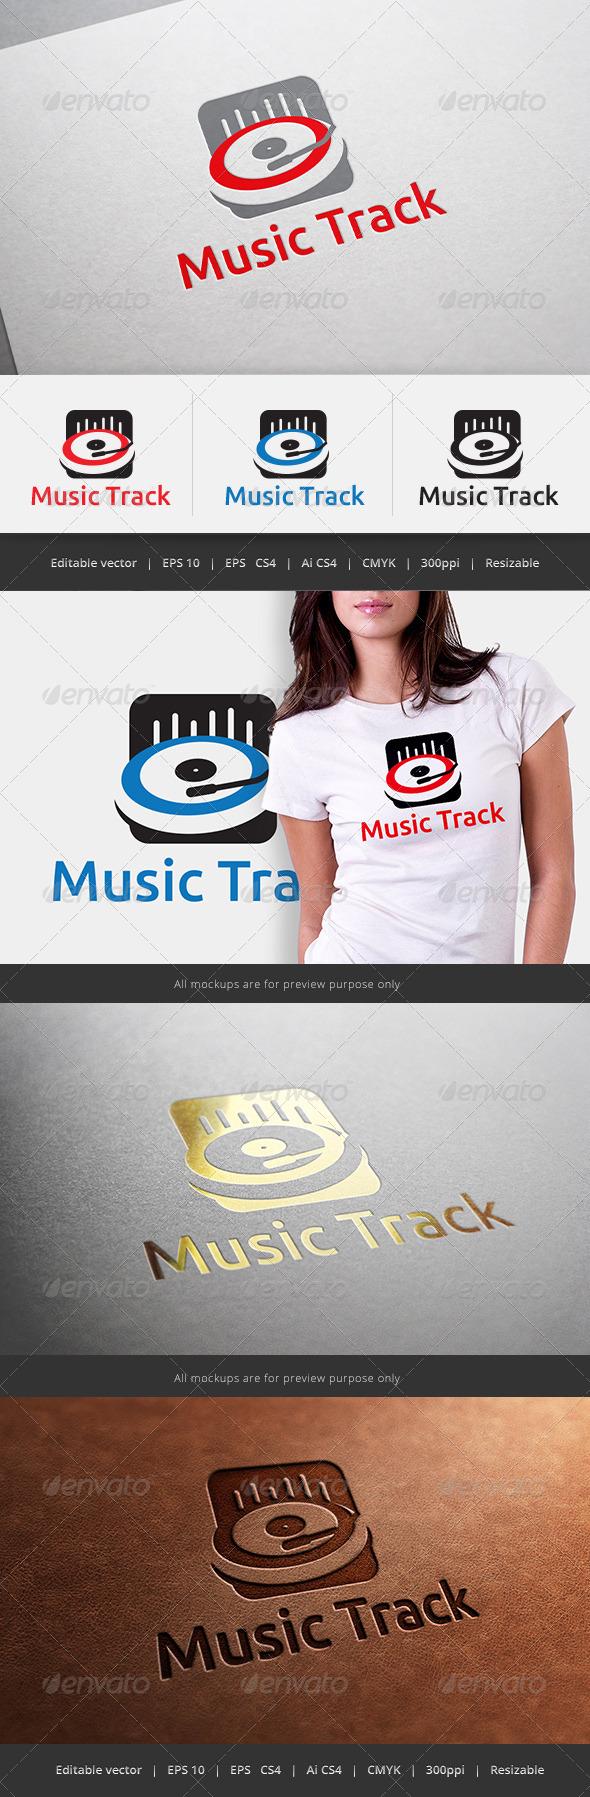 GraphicRiver Music Track Logo 5600973